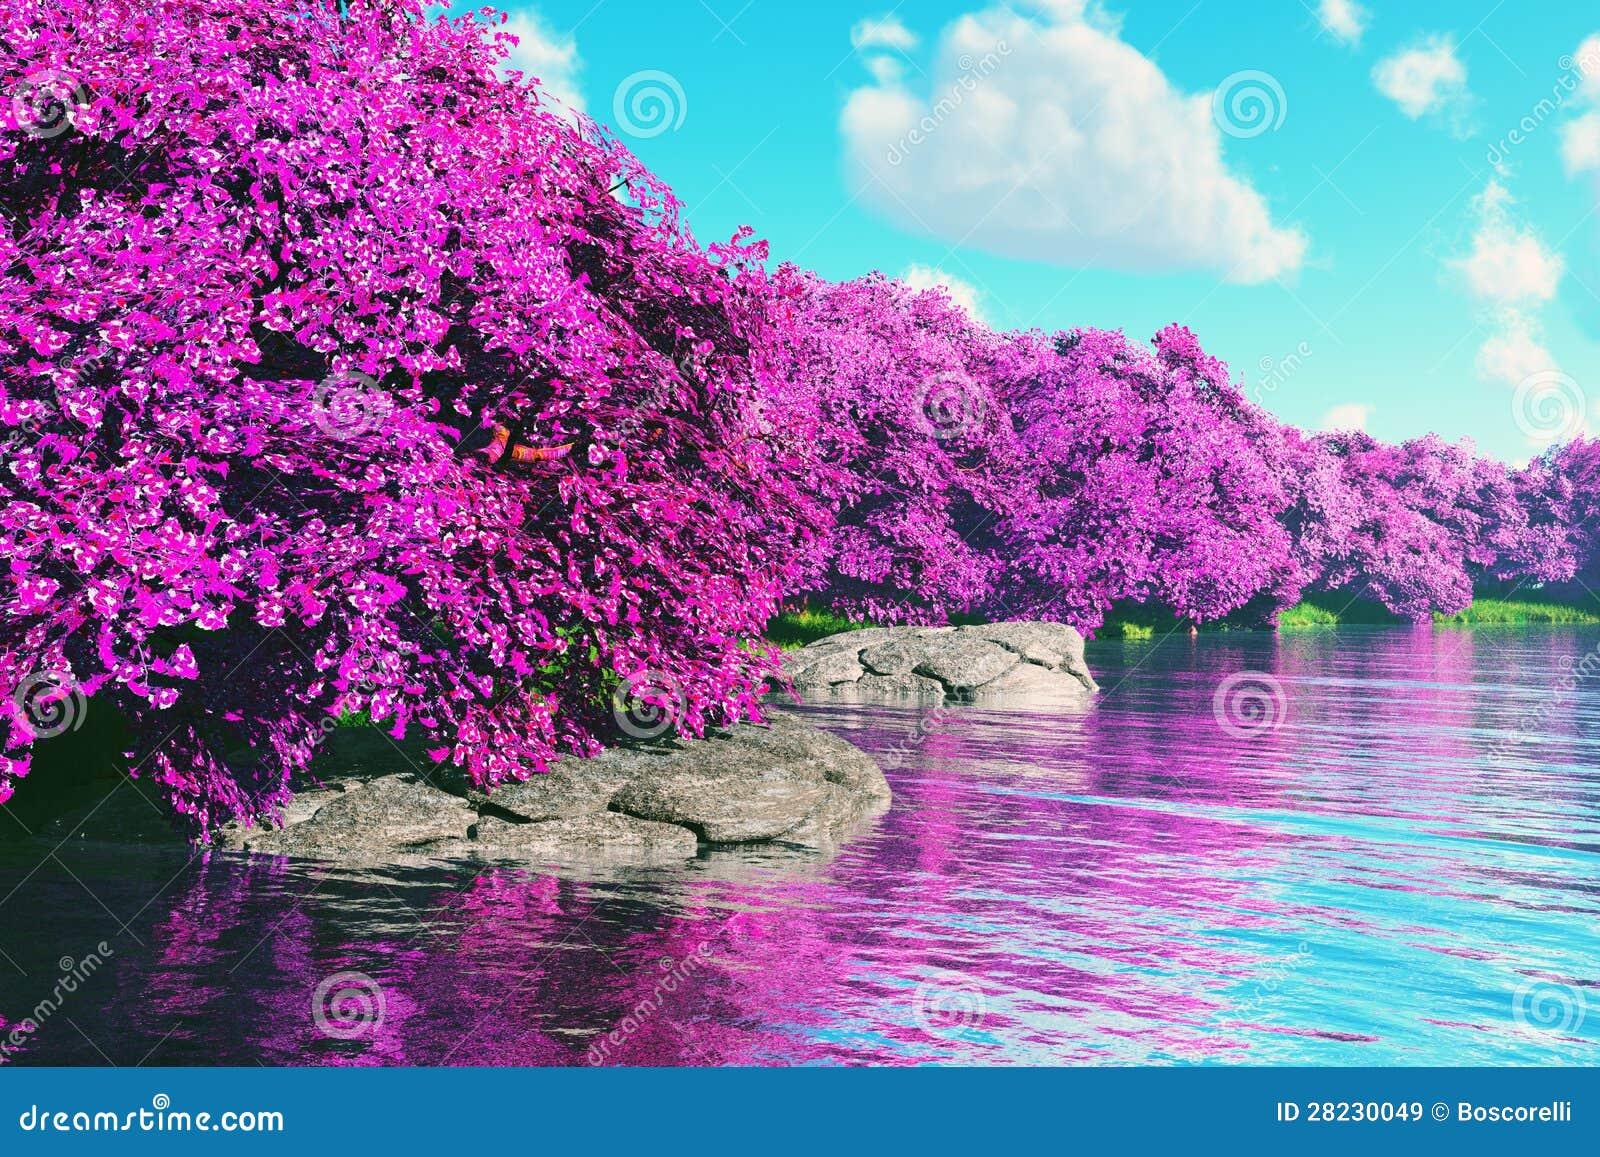 imagens jardim japones : imagens jardim japones:Japanese Cherry Blossom Garden